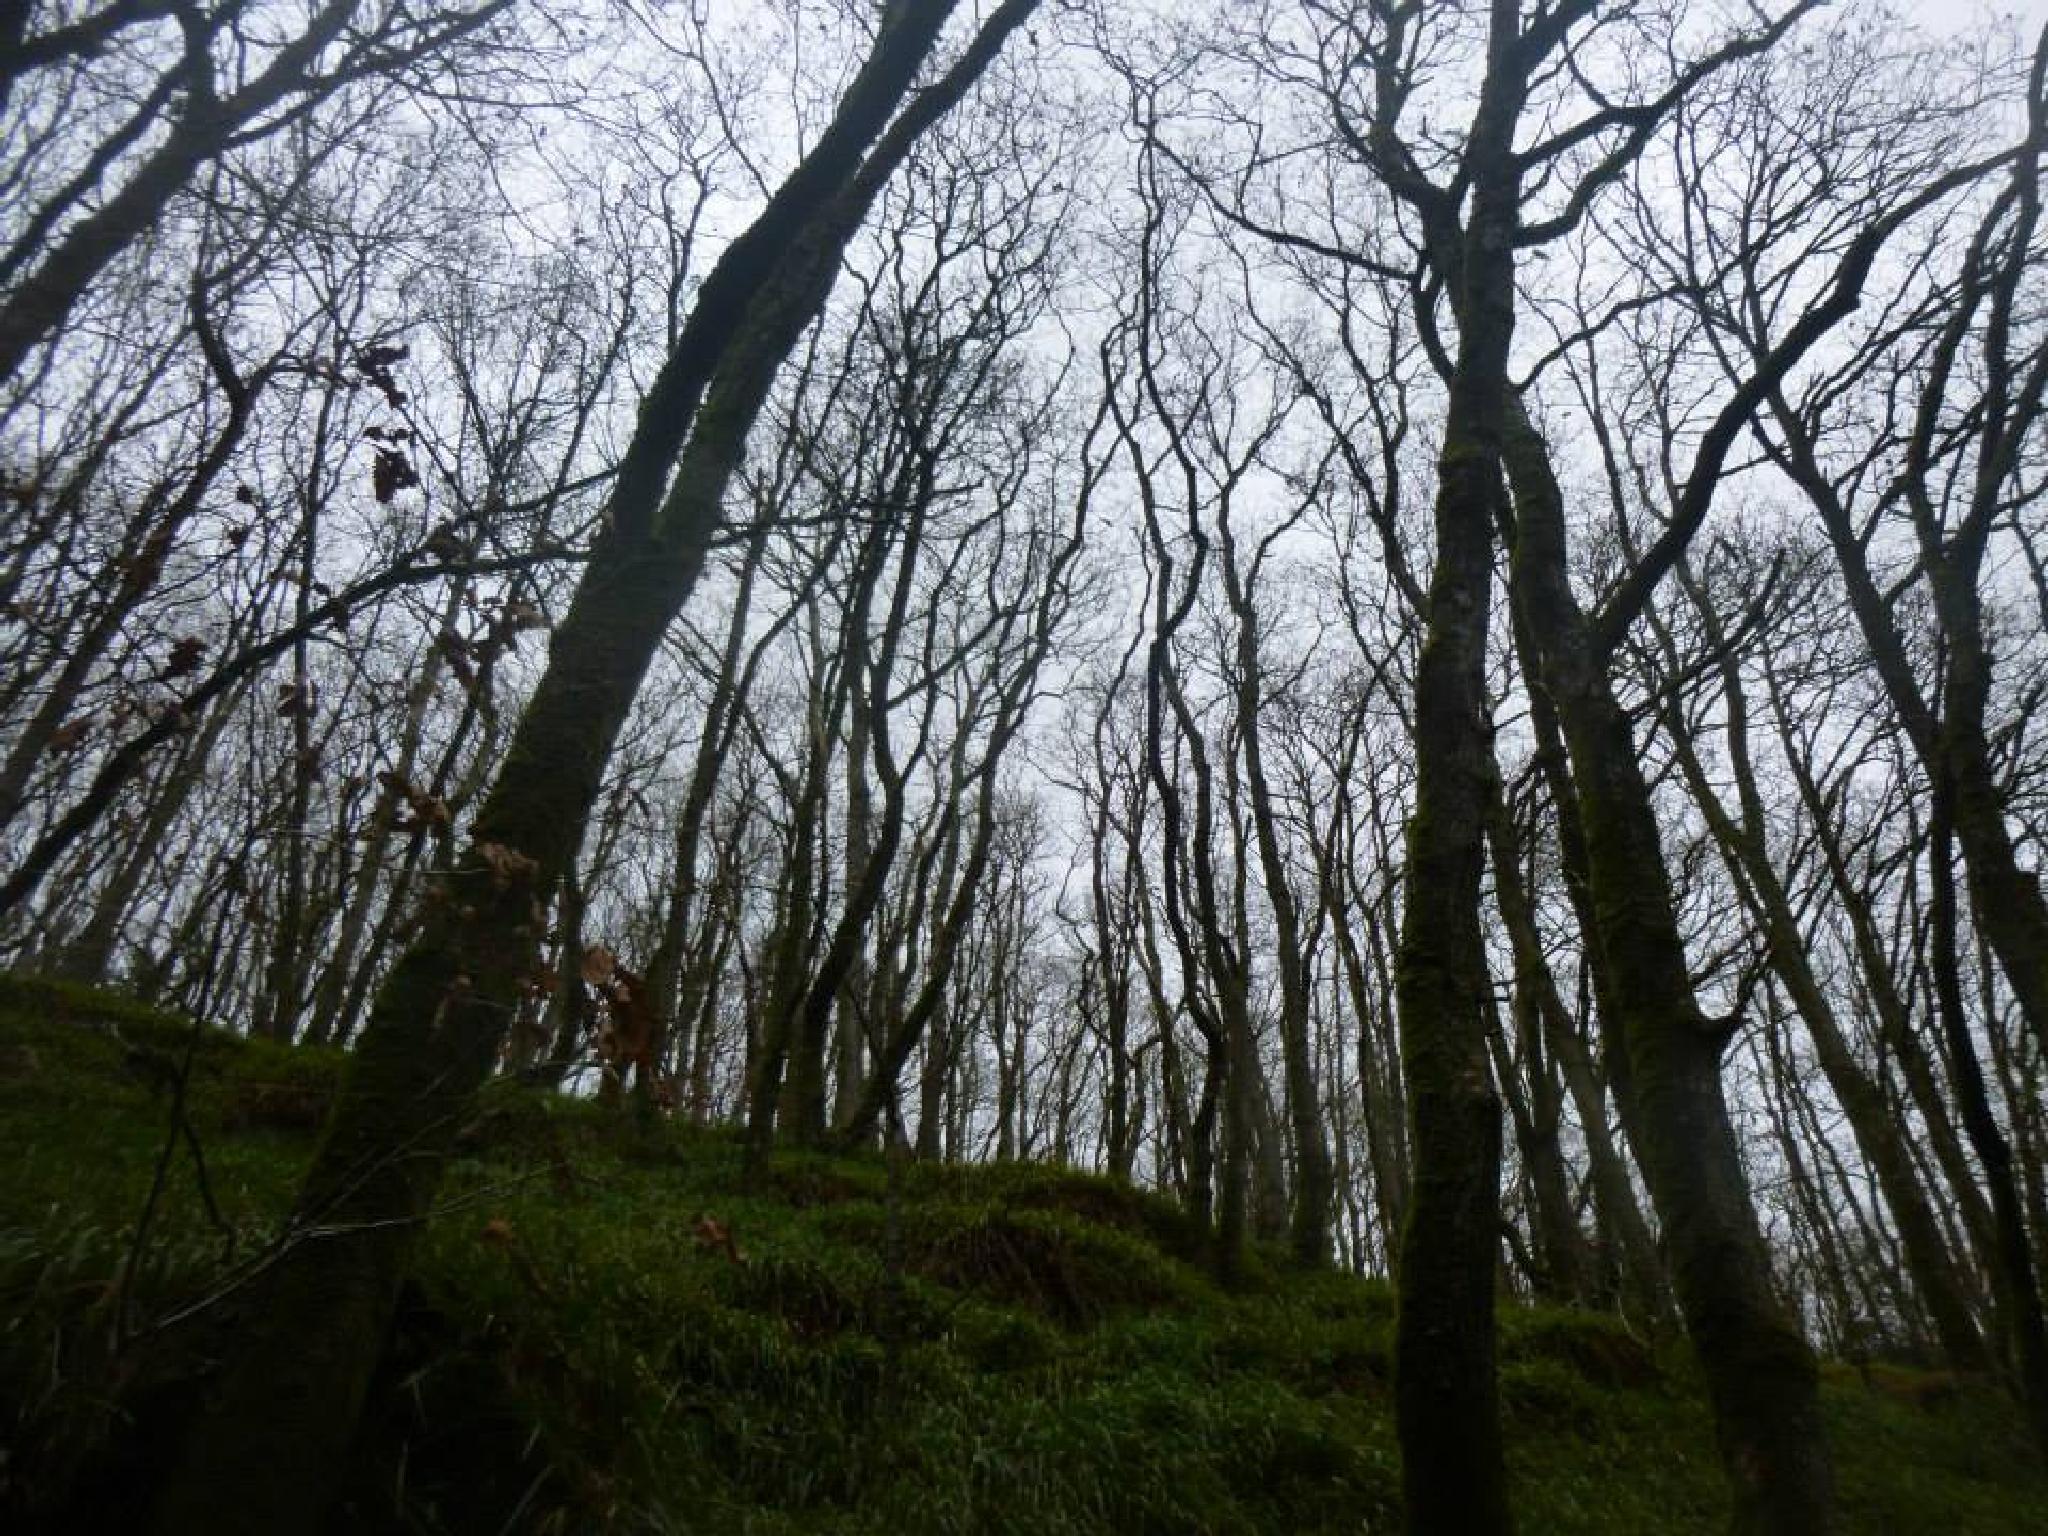 woods at cenarth by chris.adams.3557